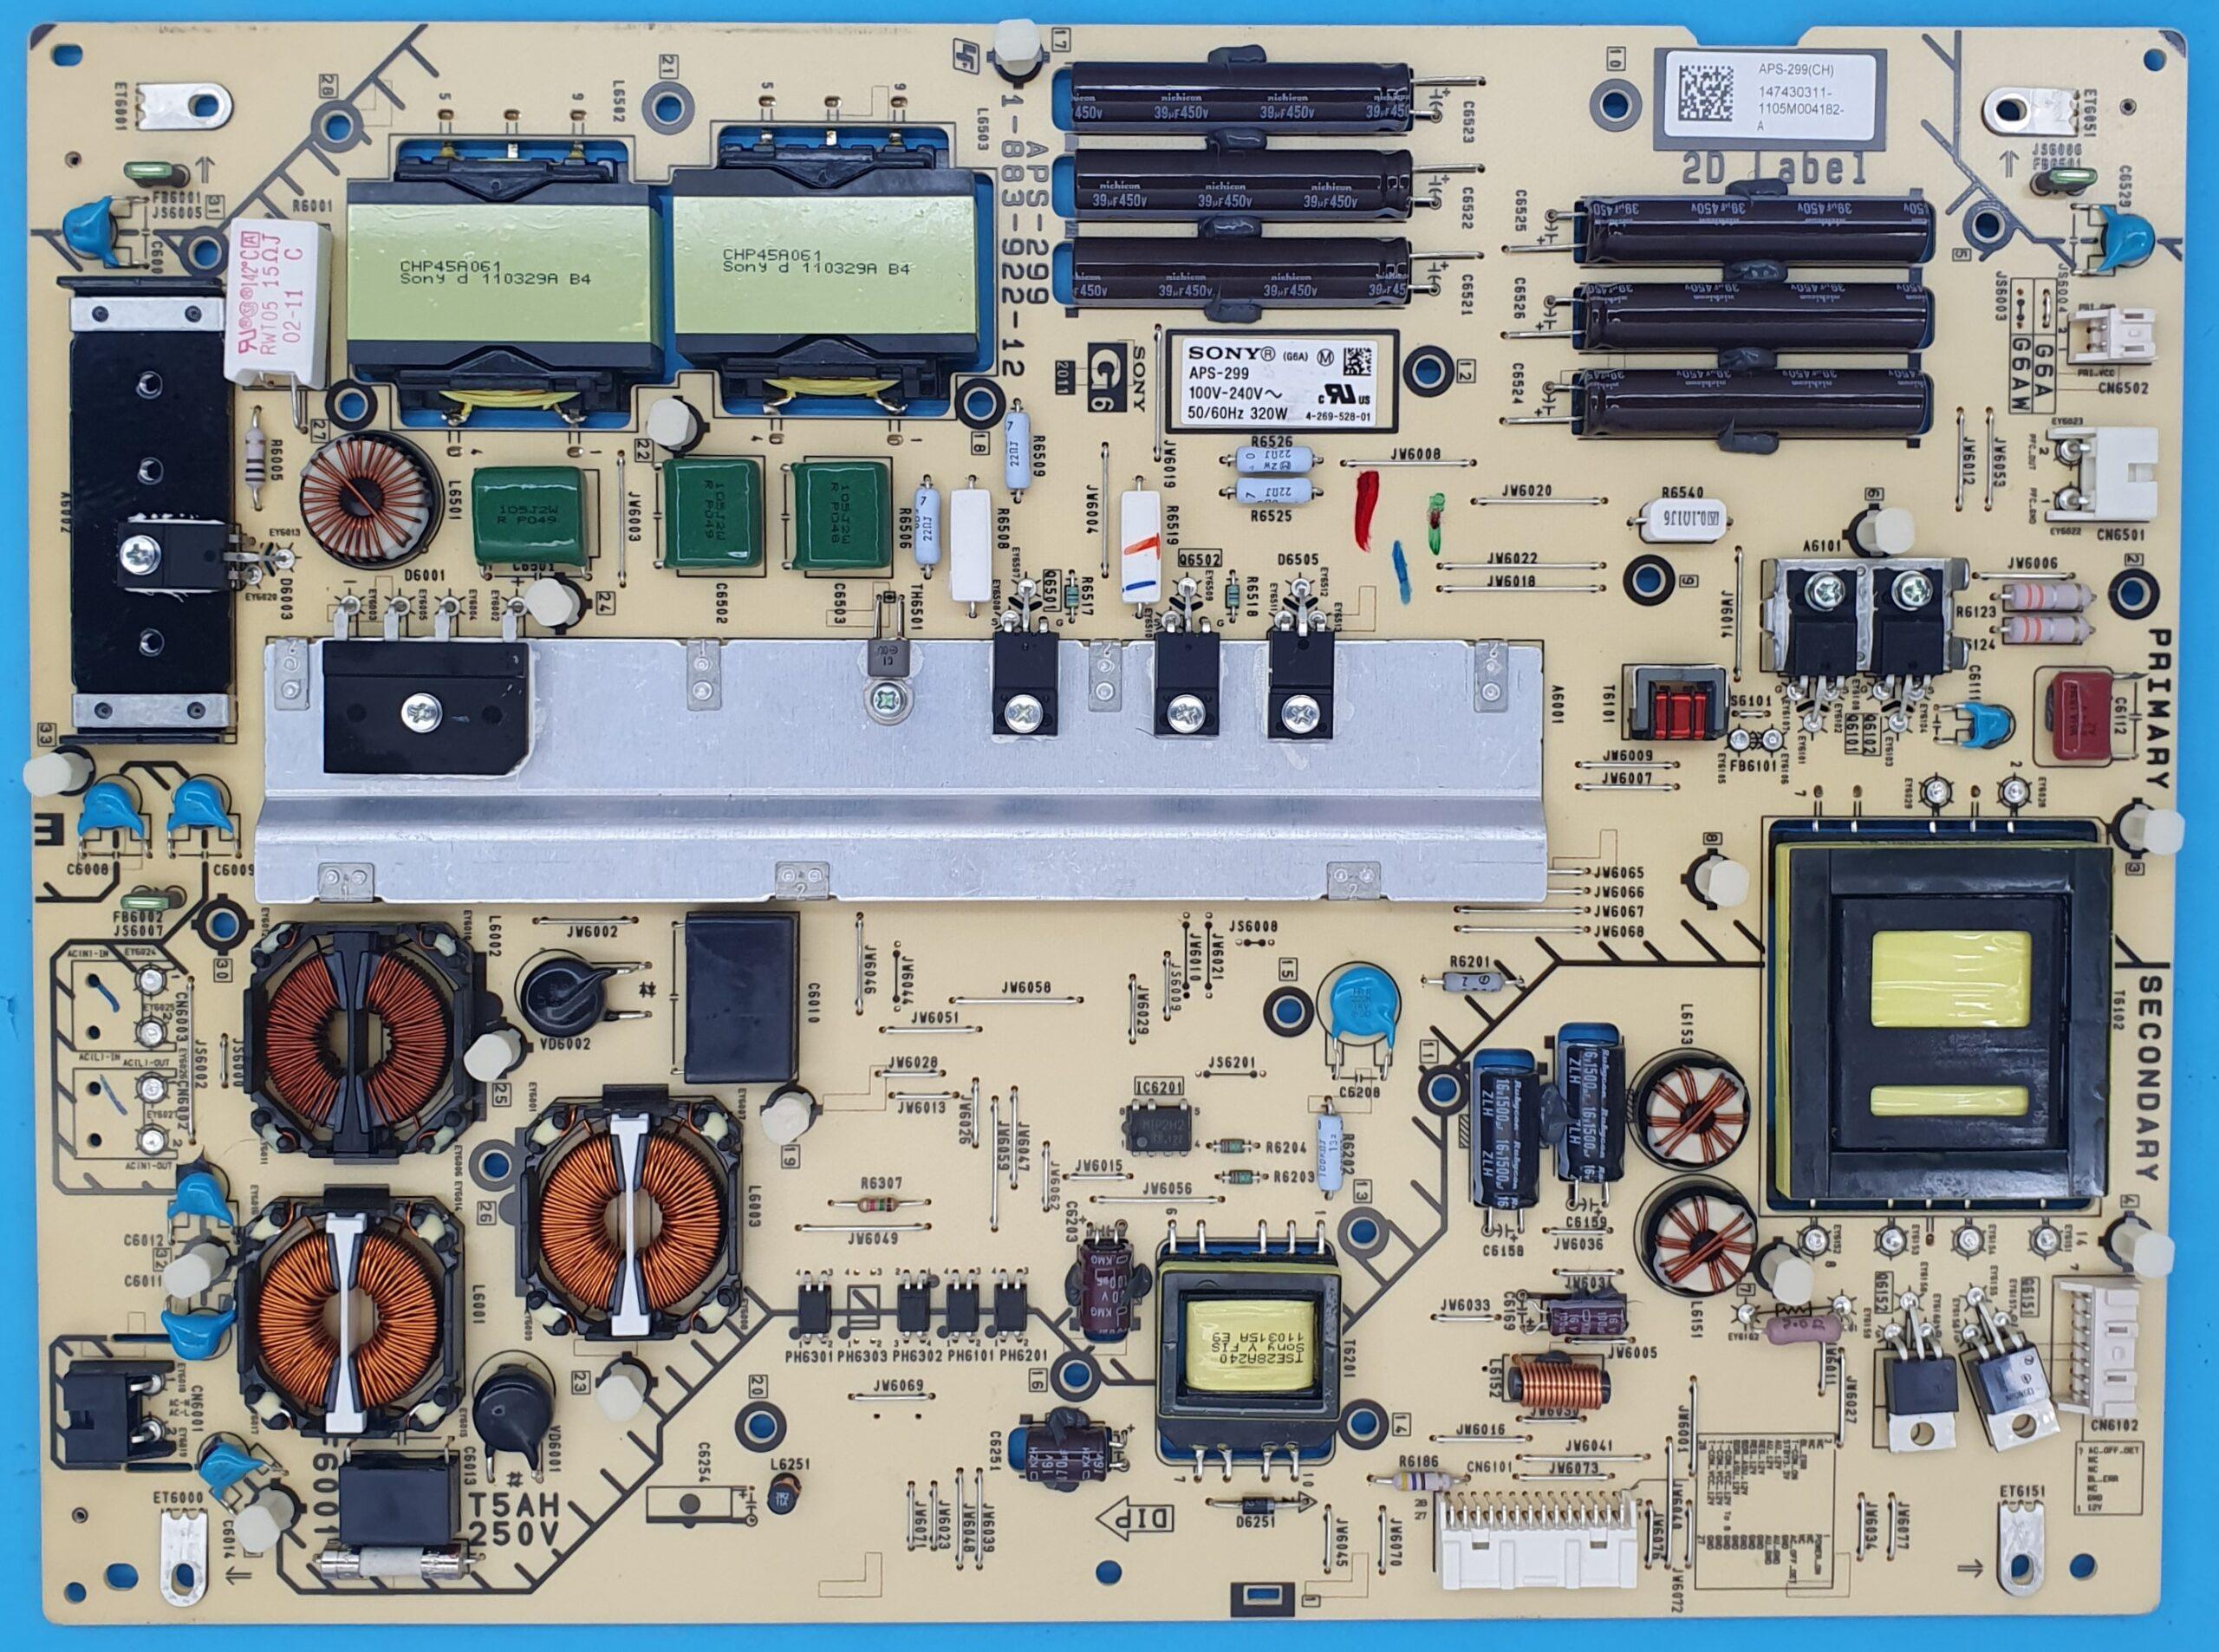 APS-299,147430311 Sony Power (KDV DAHİL = 300 TL)